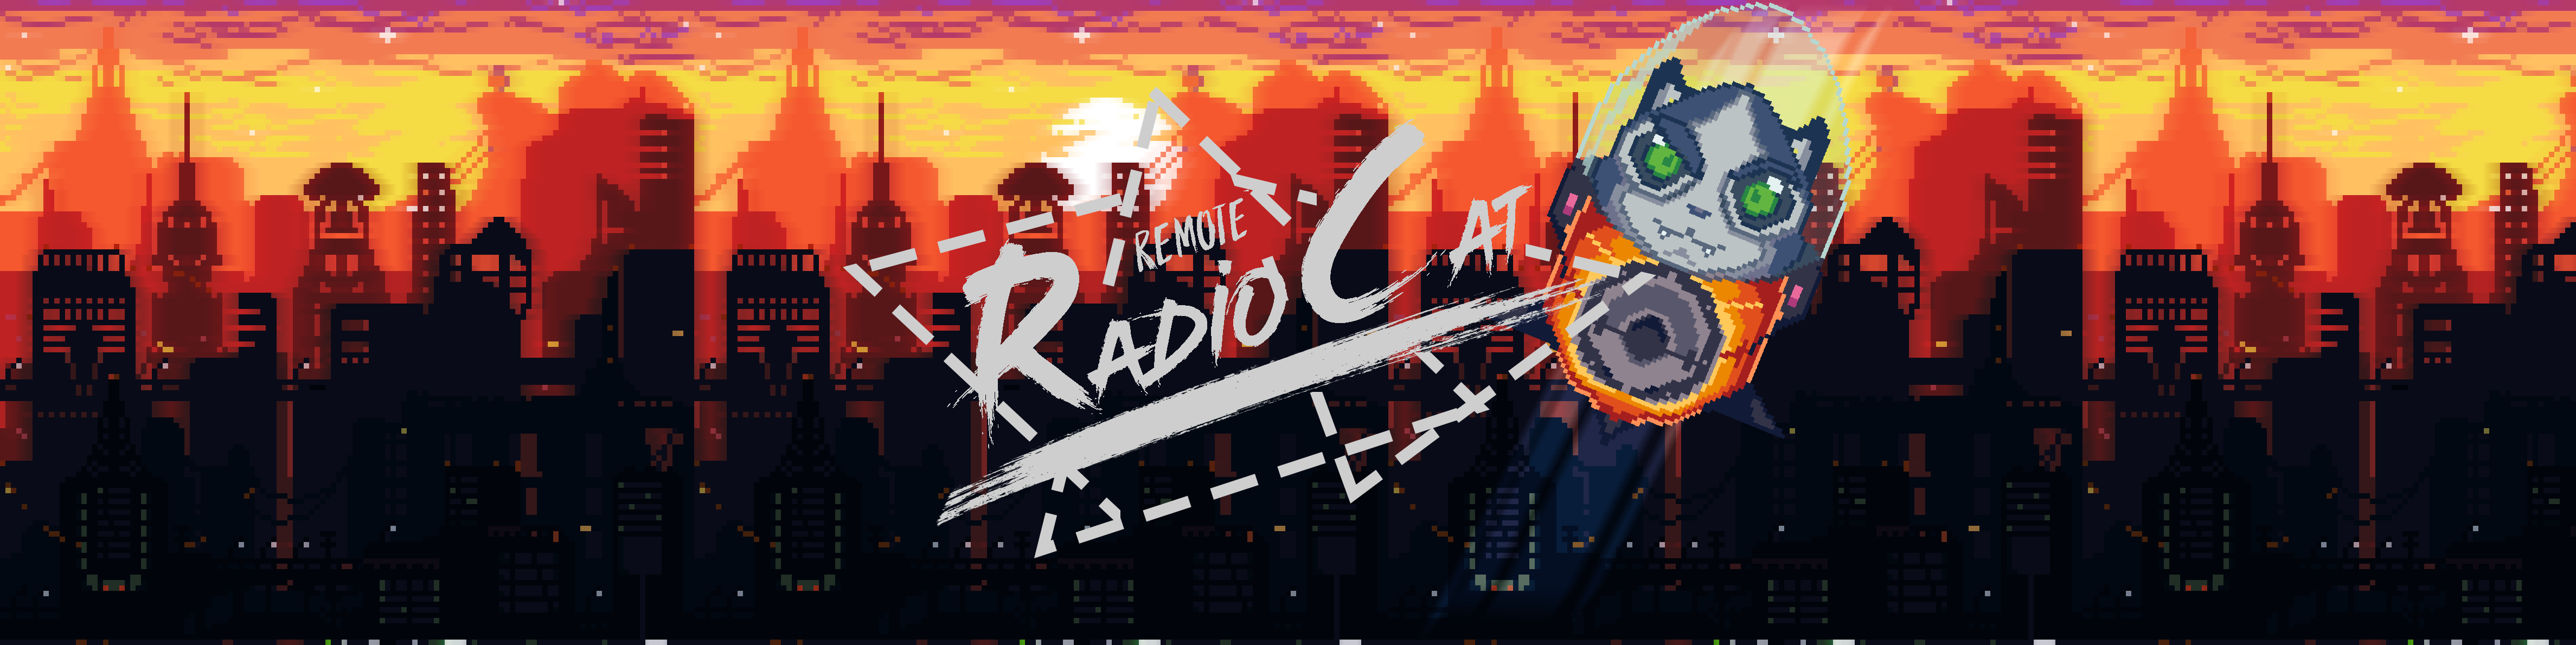 Remote RadioCat